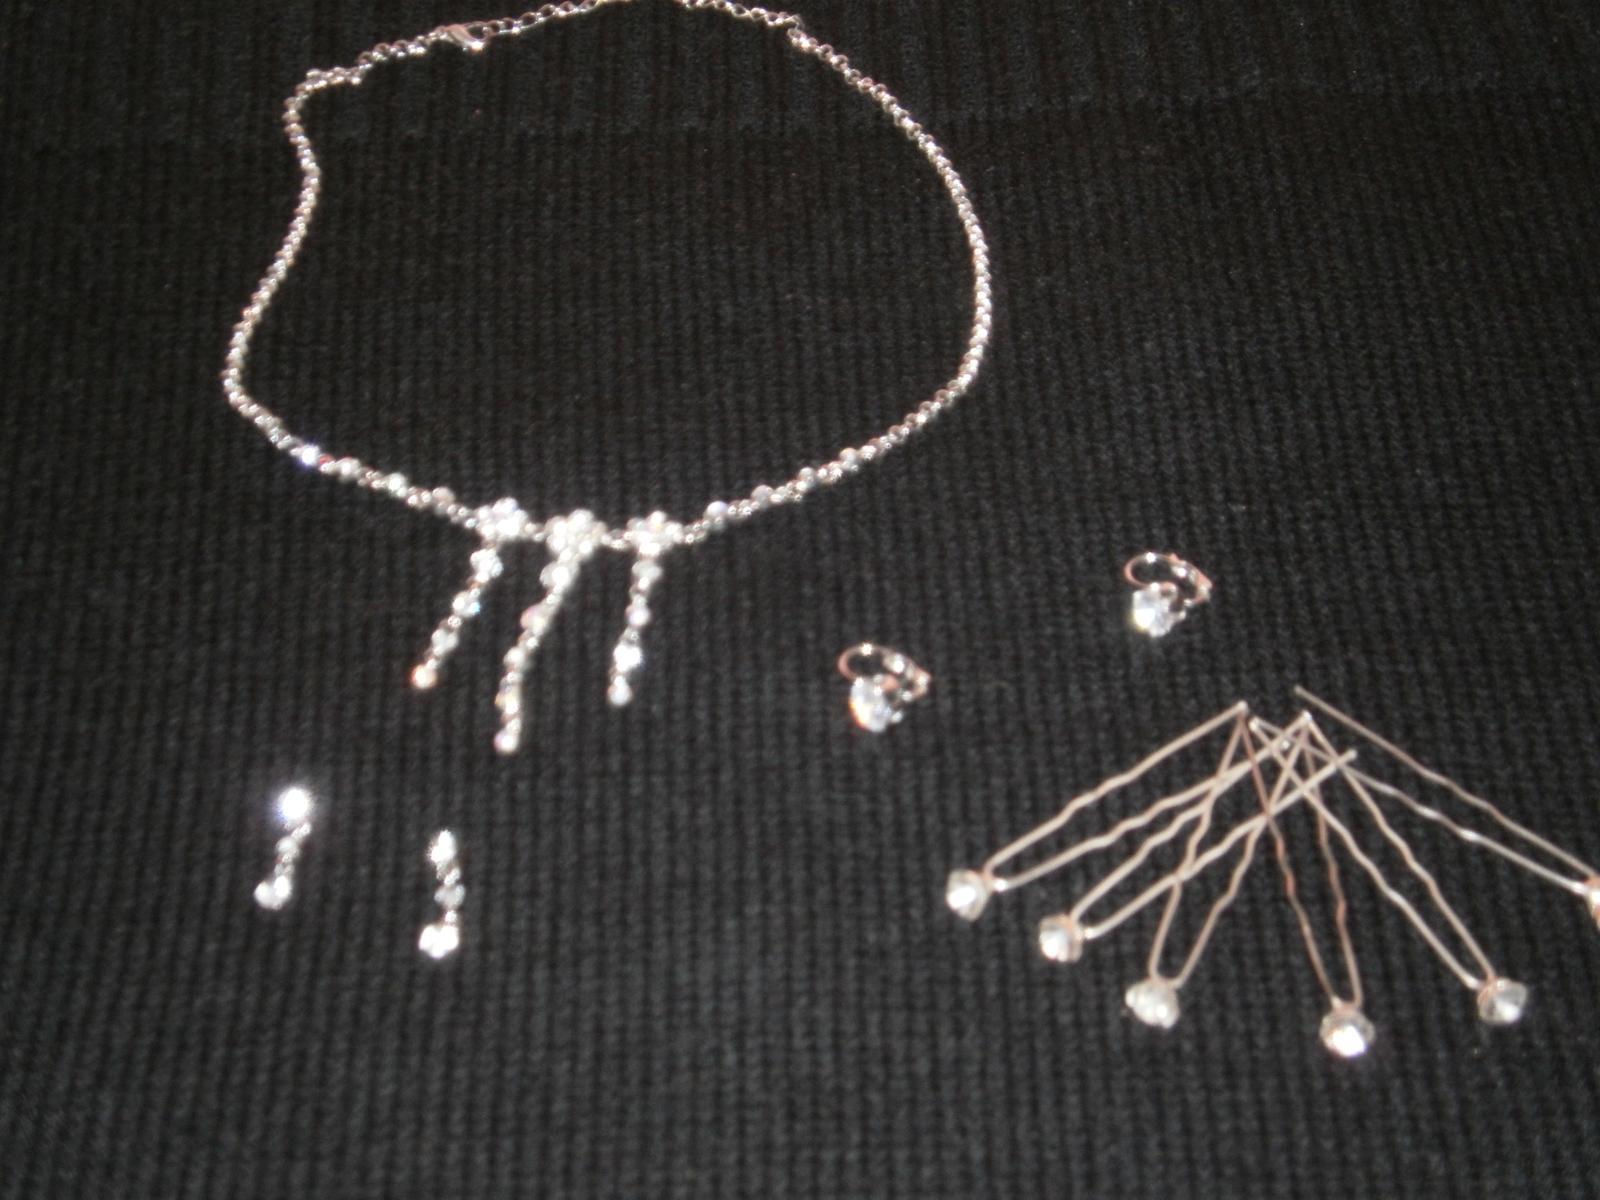 Náhrdelník, 2x náušnice, 6ks vláseniek s kamienkom - Obrázok č. 1